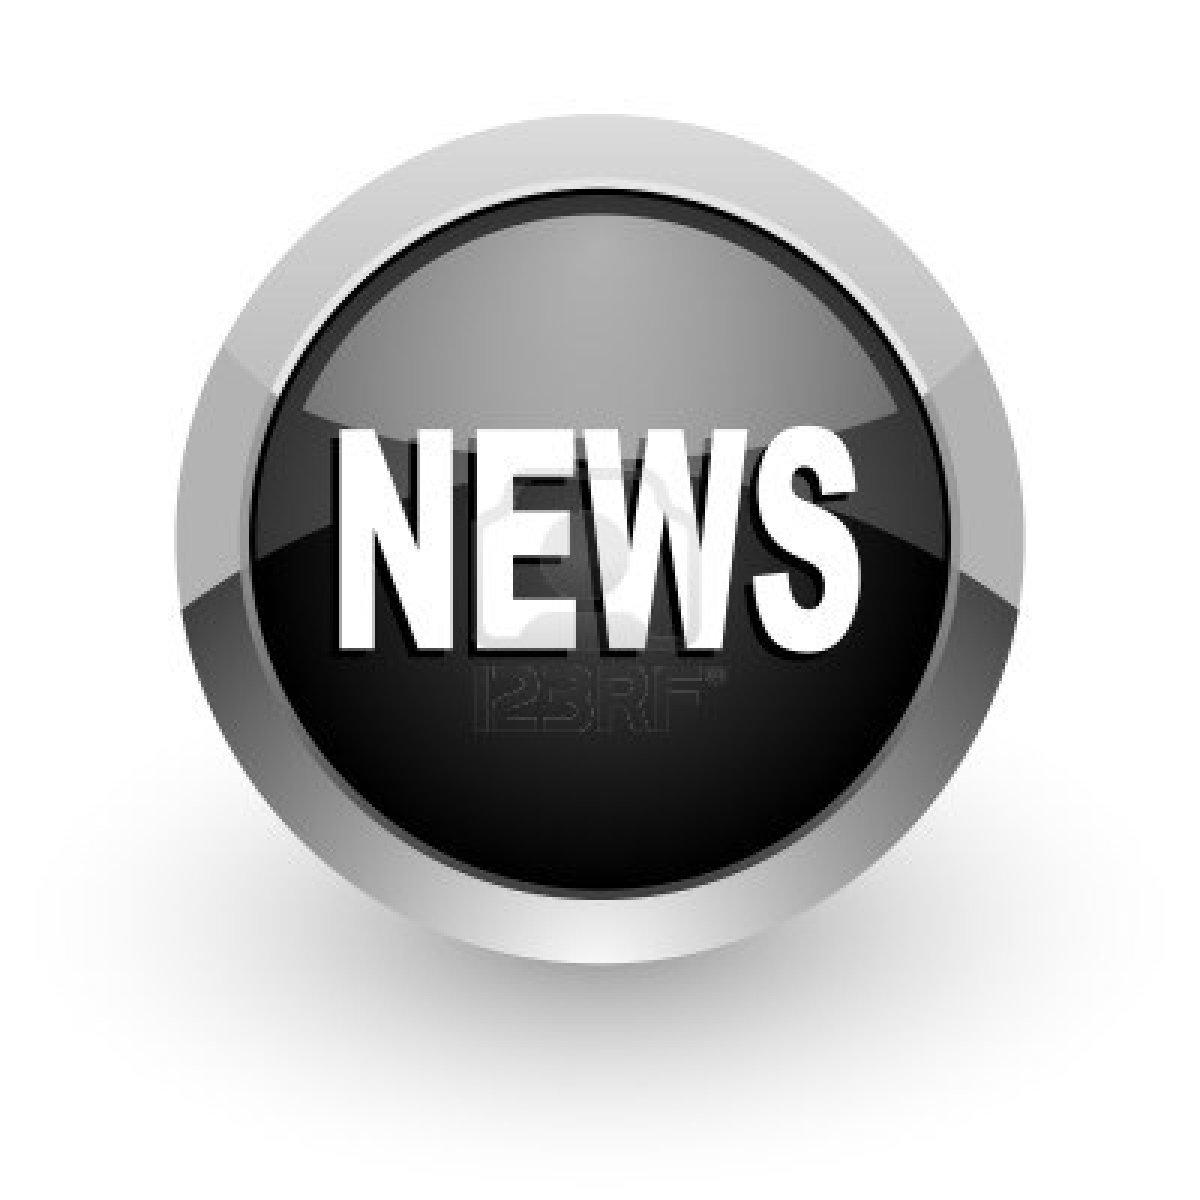 14553487-news-icon.jpg